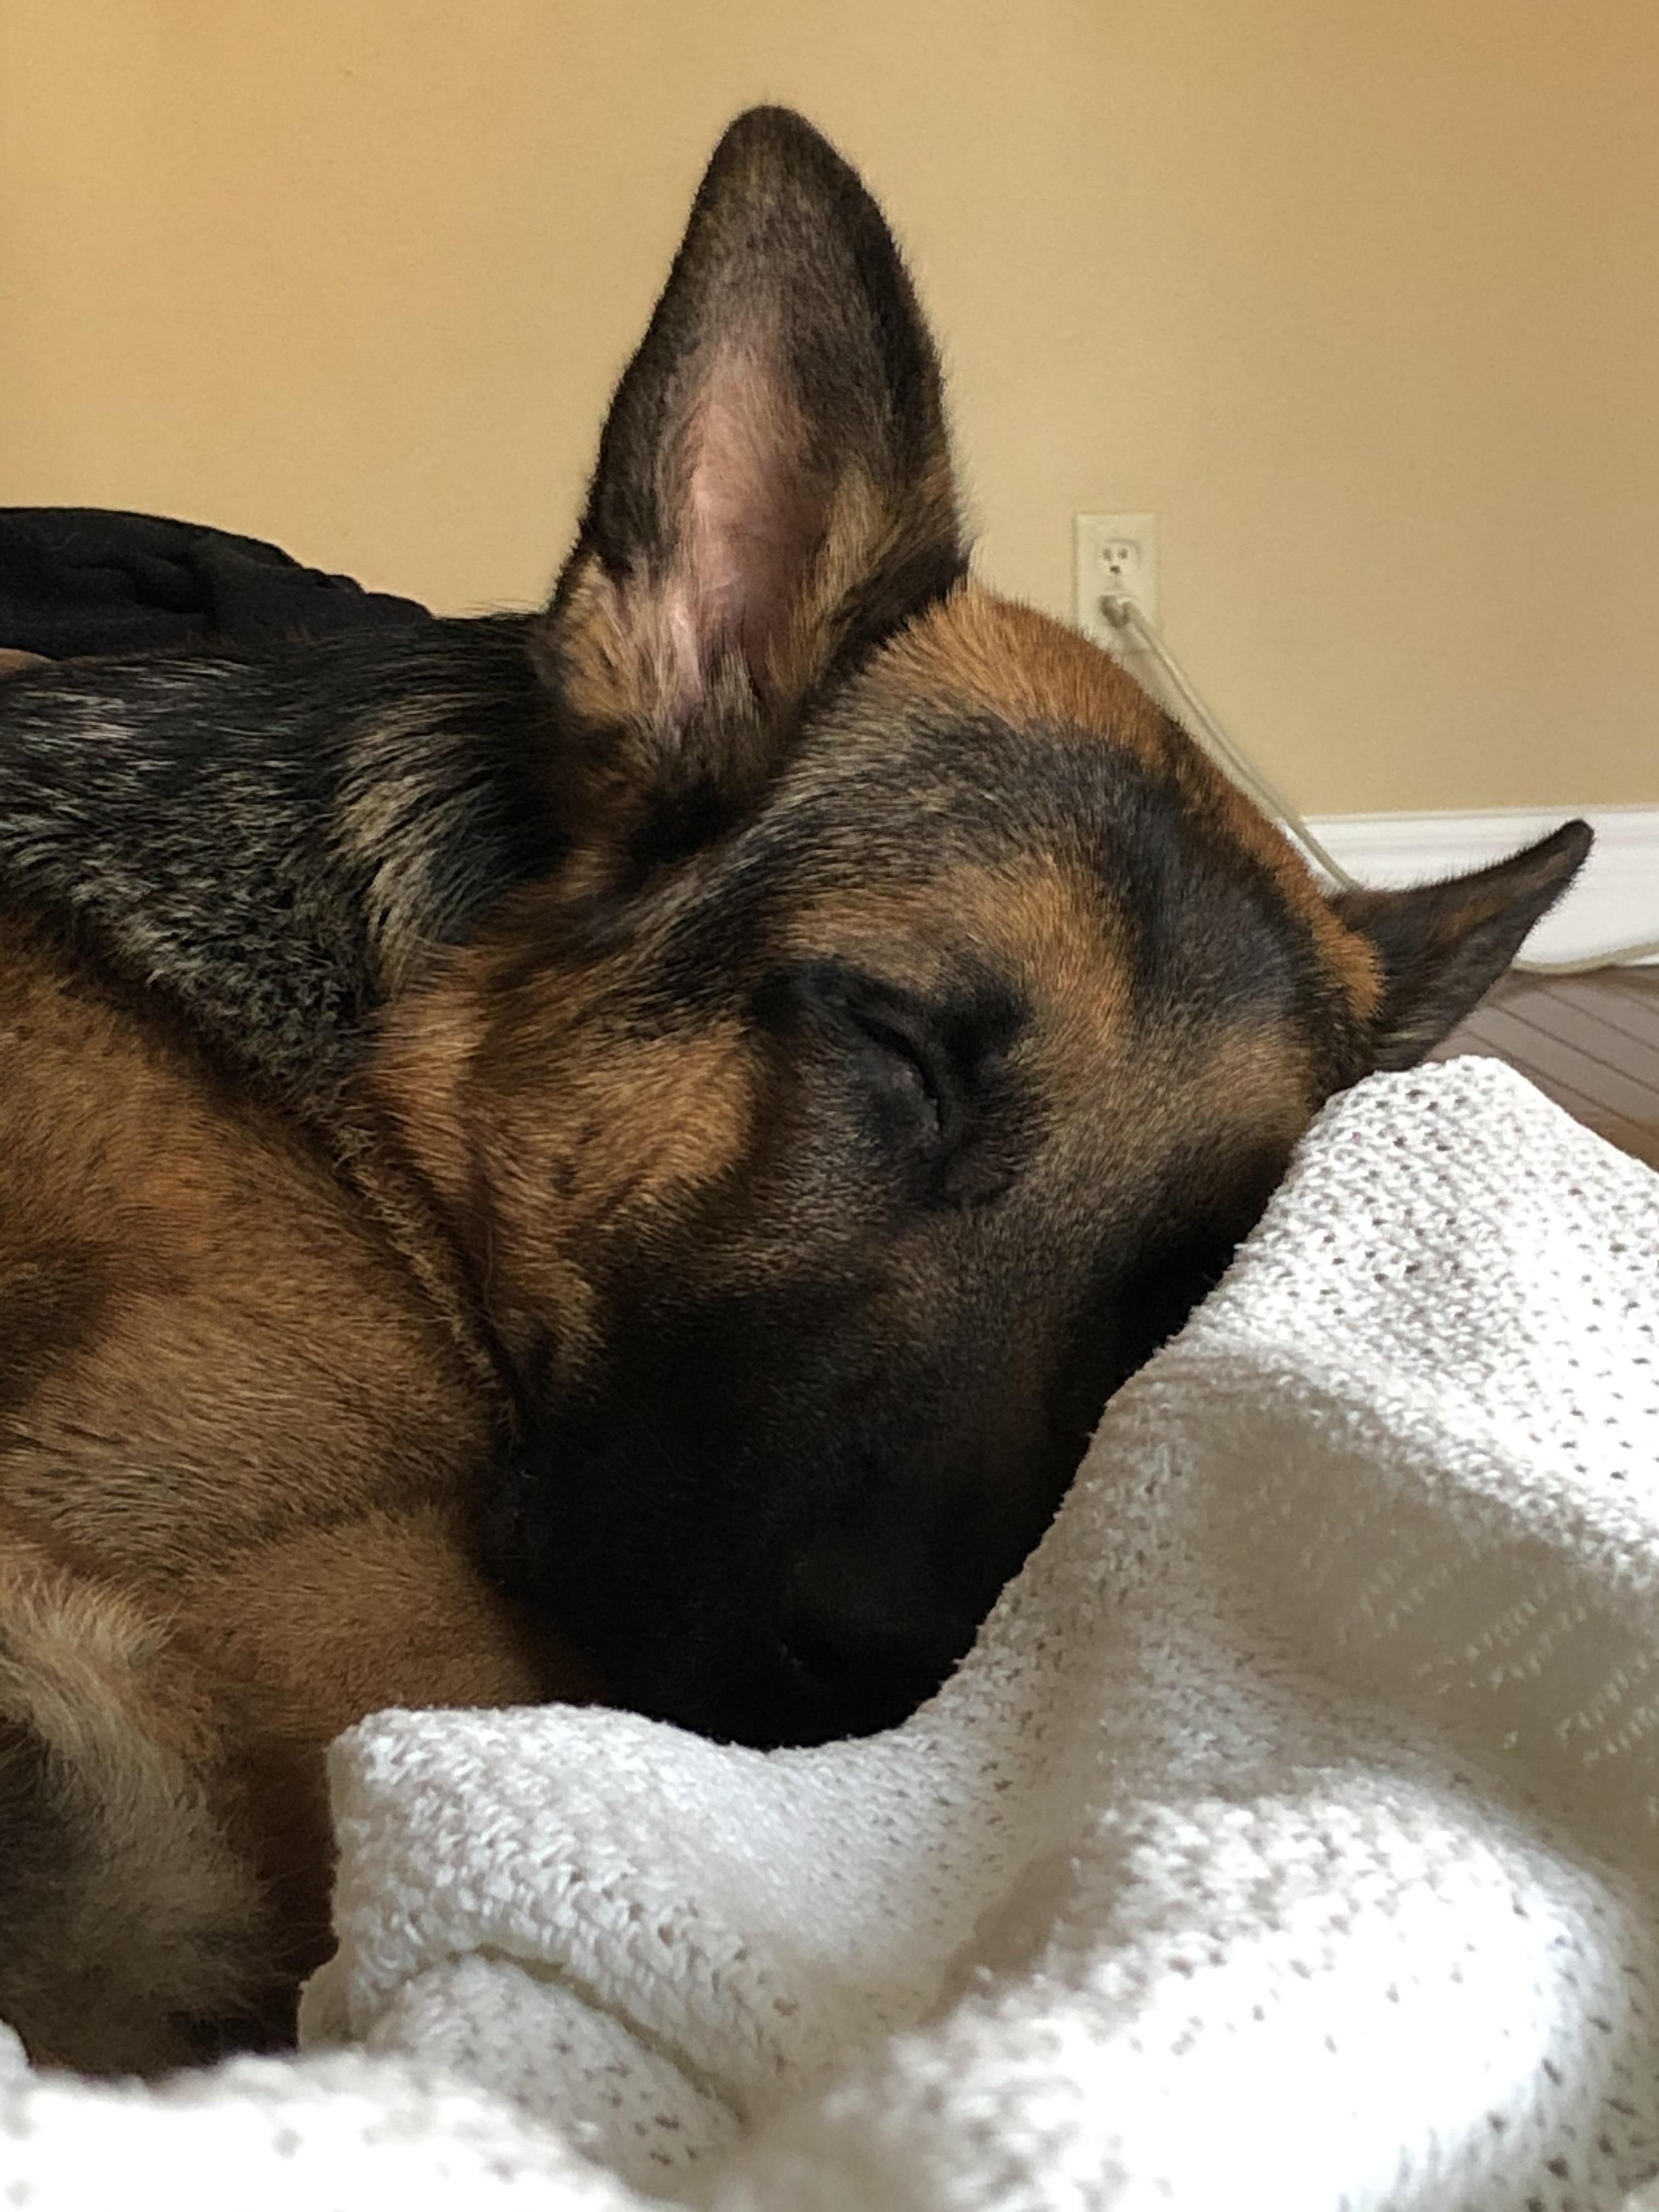 44 German Shepherd Mix Breed Reviews In 2020 German Shepherd Dogs Grand Dog Pitbull Dog